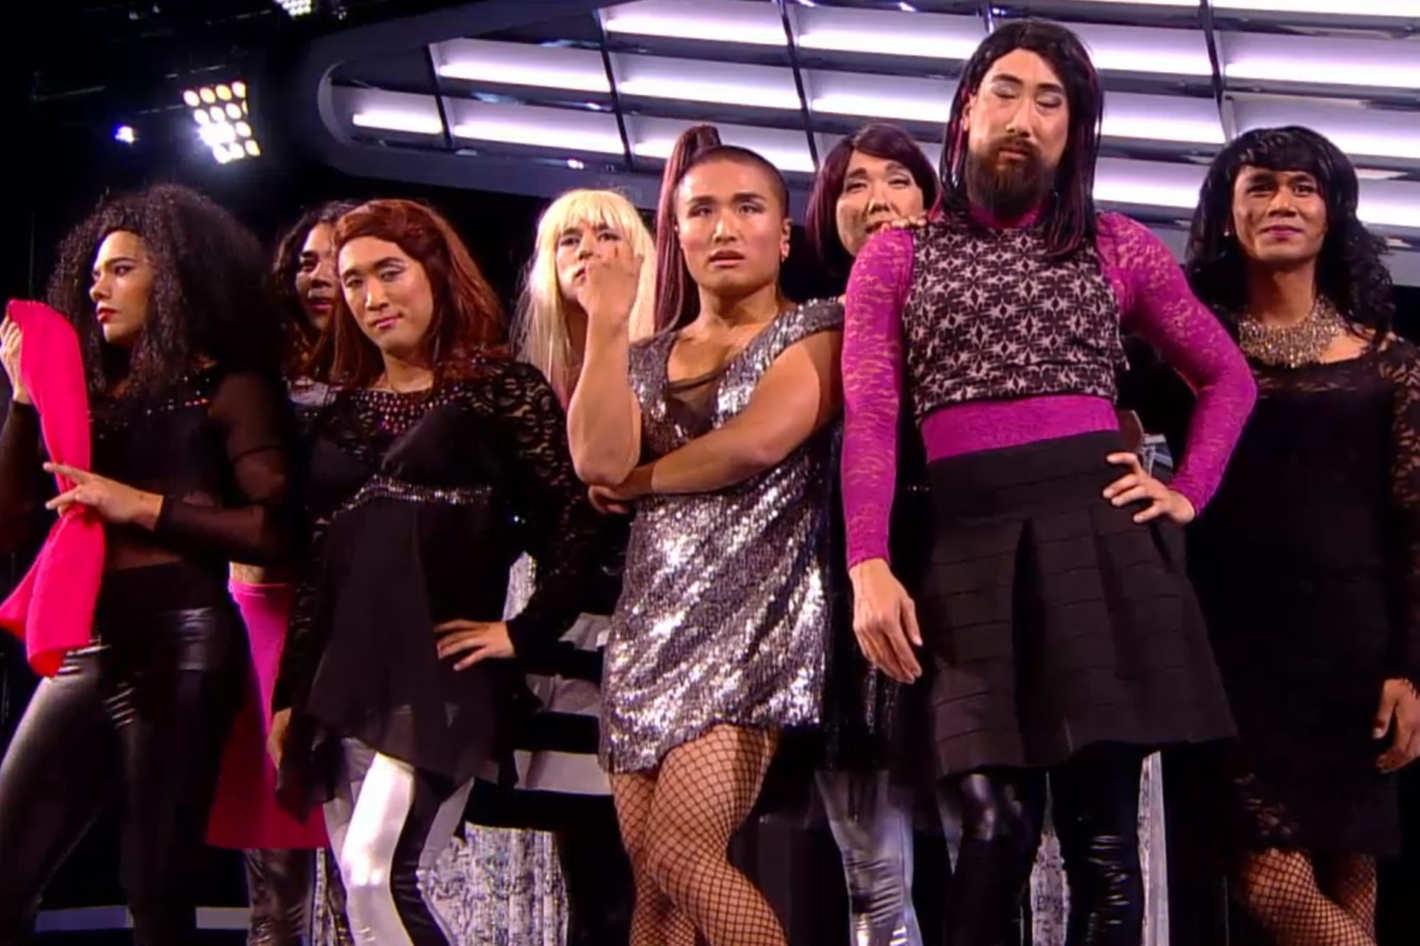 Watch Quest Crews Ariana Grande Drag Performance On Americas Best Dance Crew